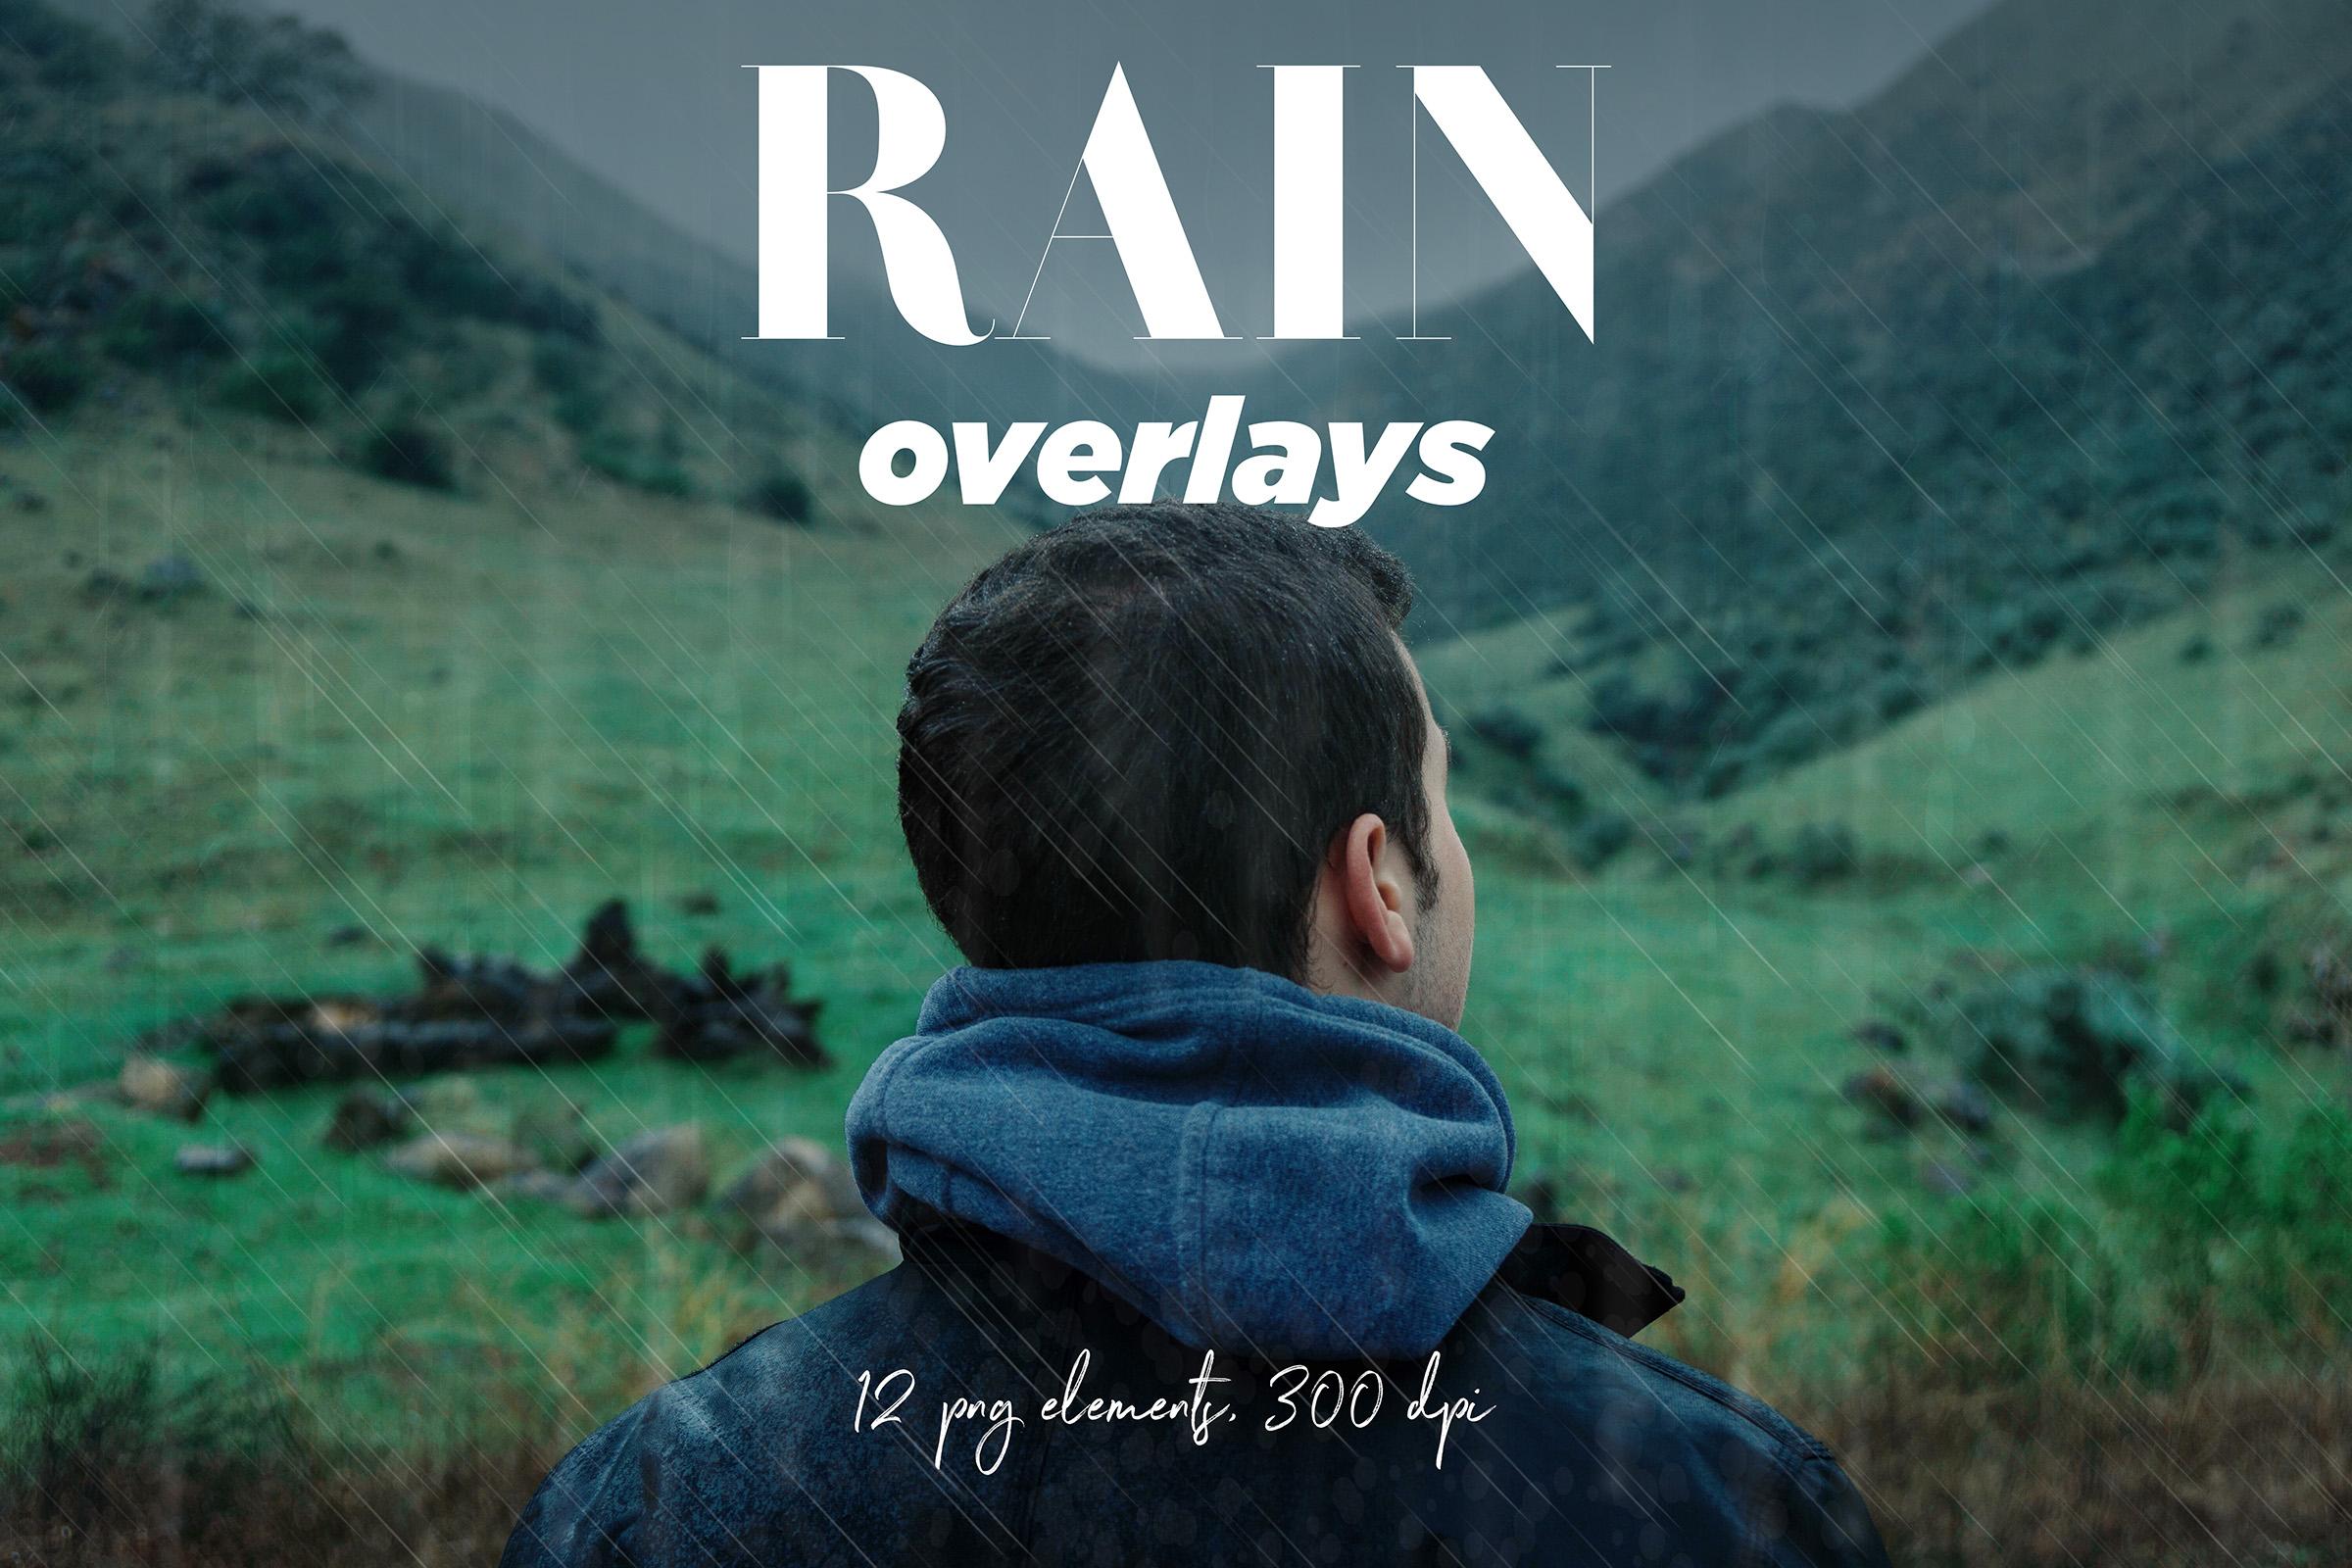 Rain Overlays Clipart, Falling Rain, Photoshop Overlays example image 1